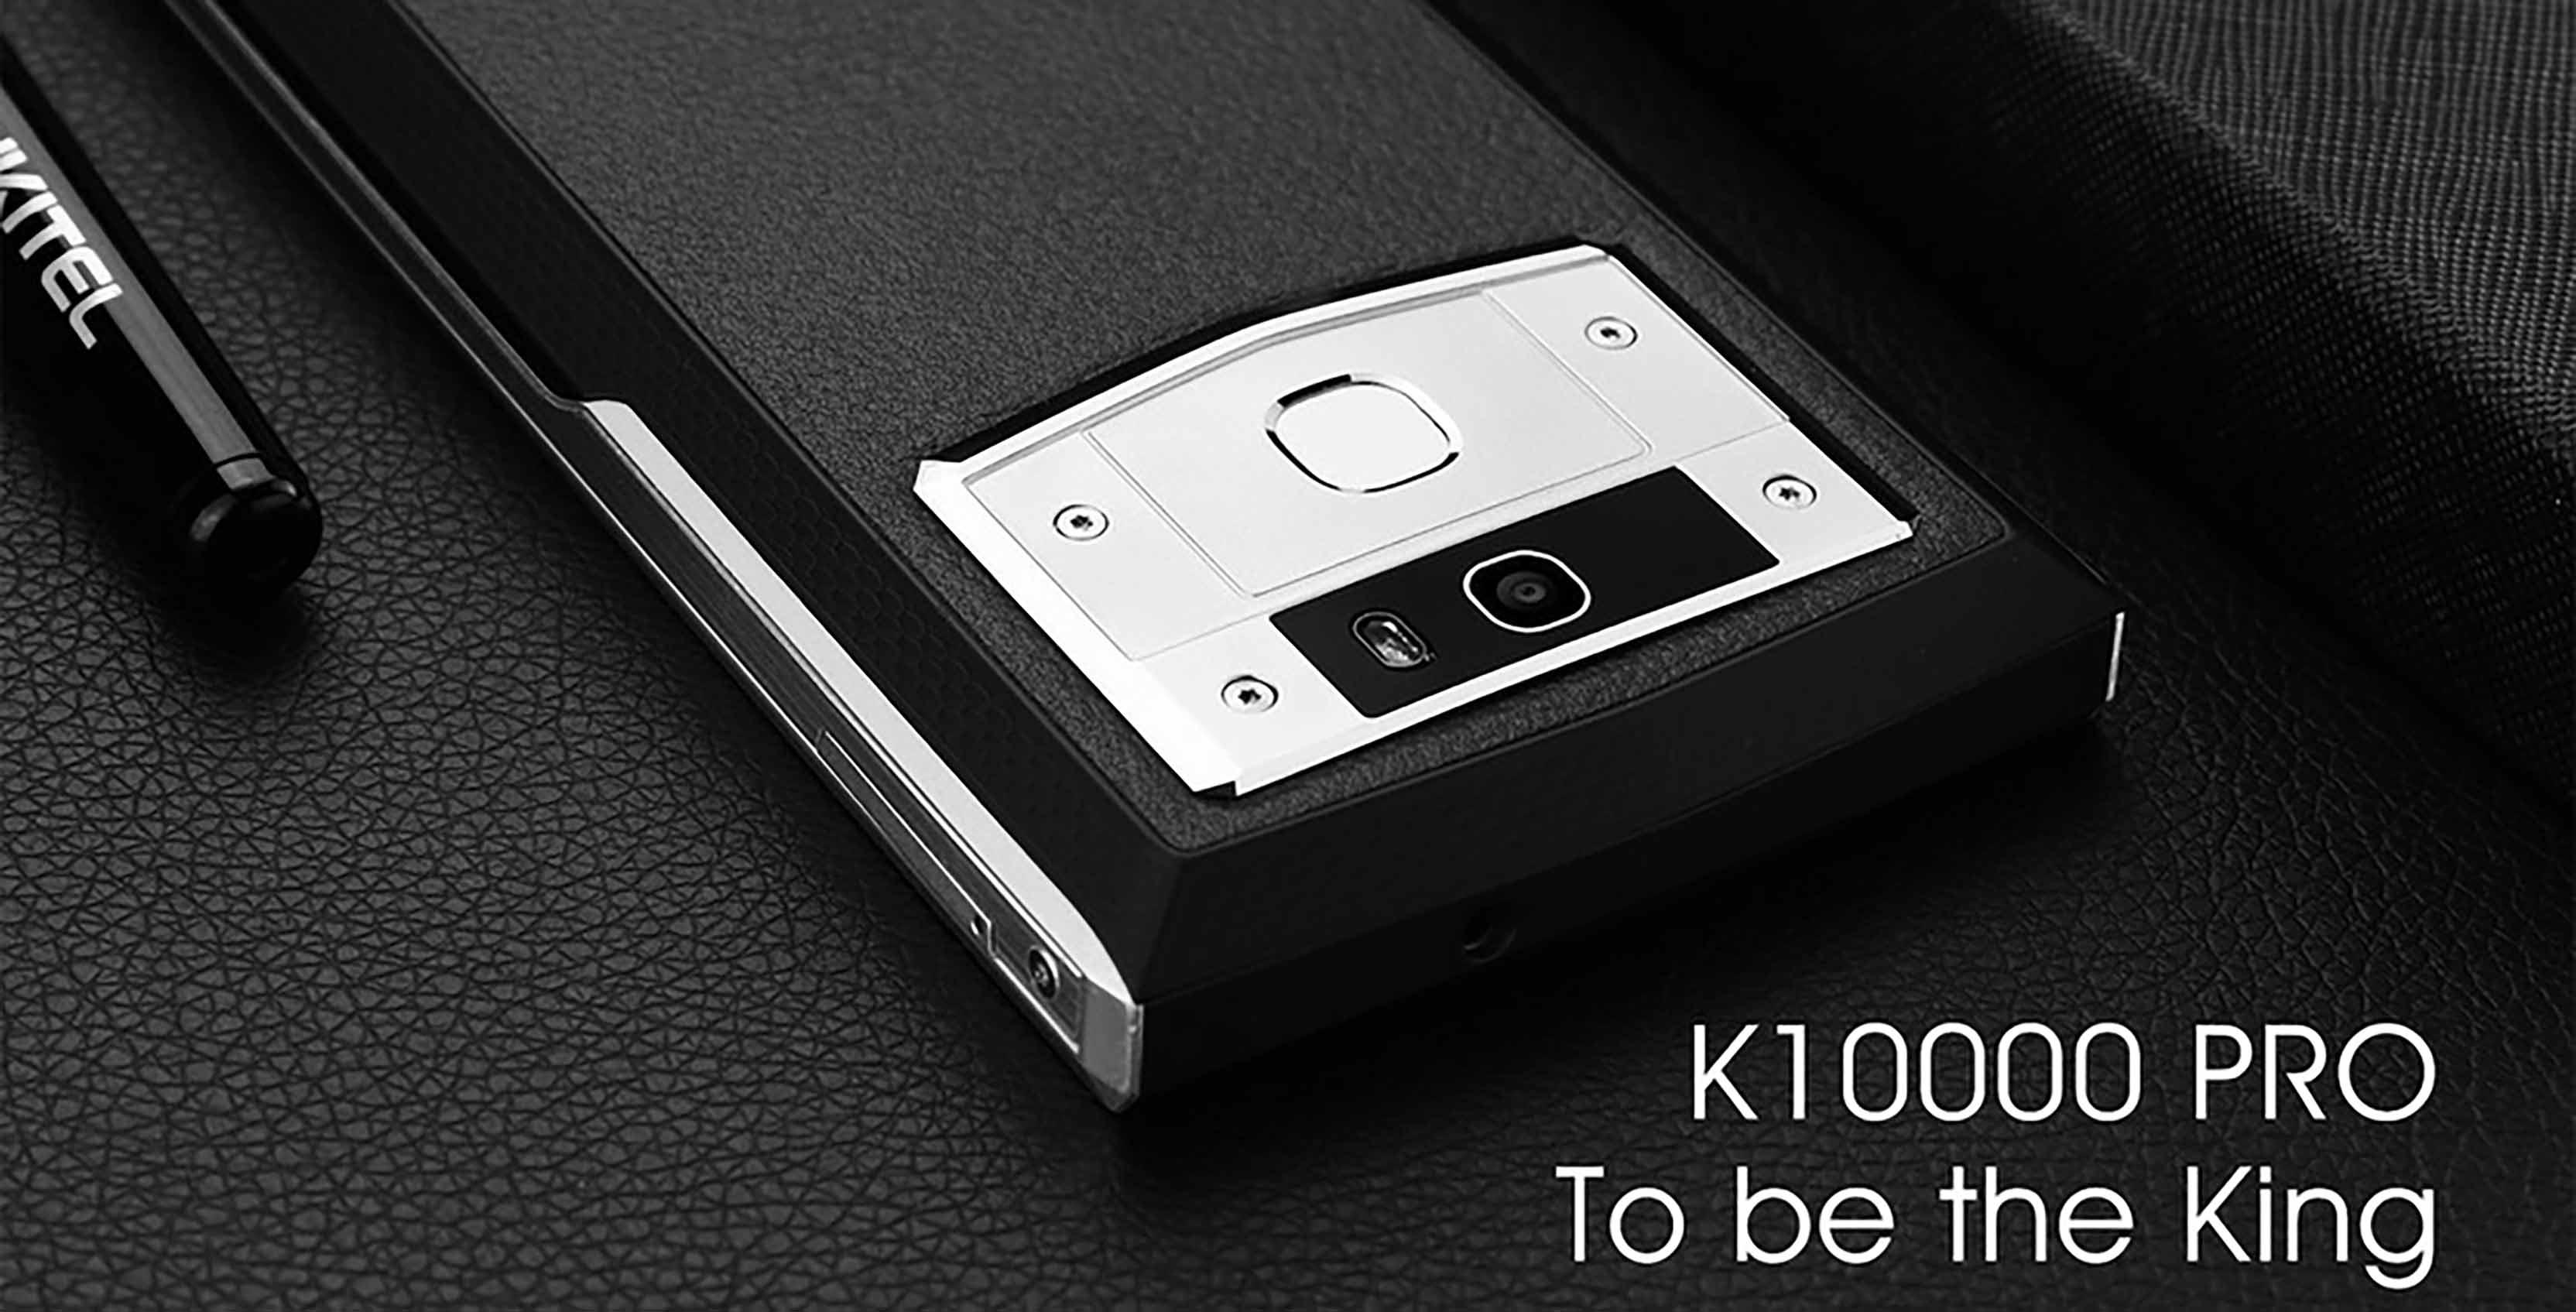 K10000 Pro Oukitel smartphone